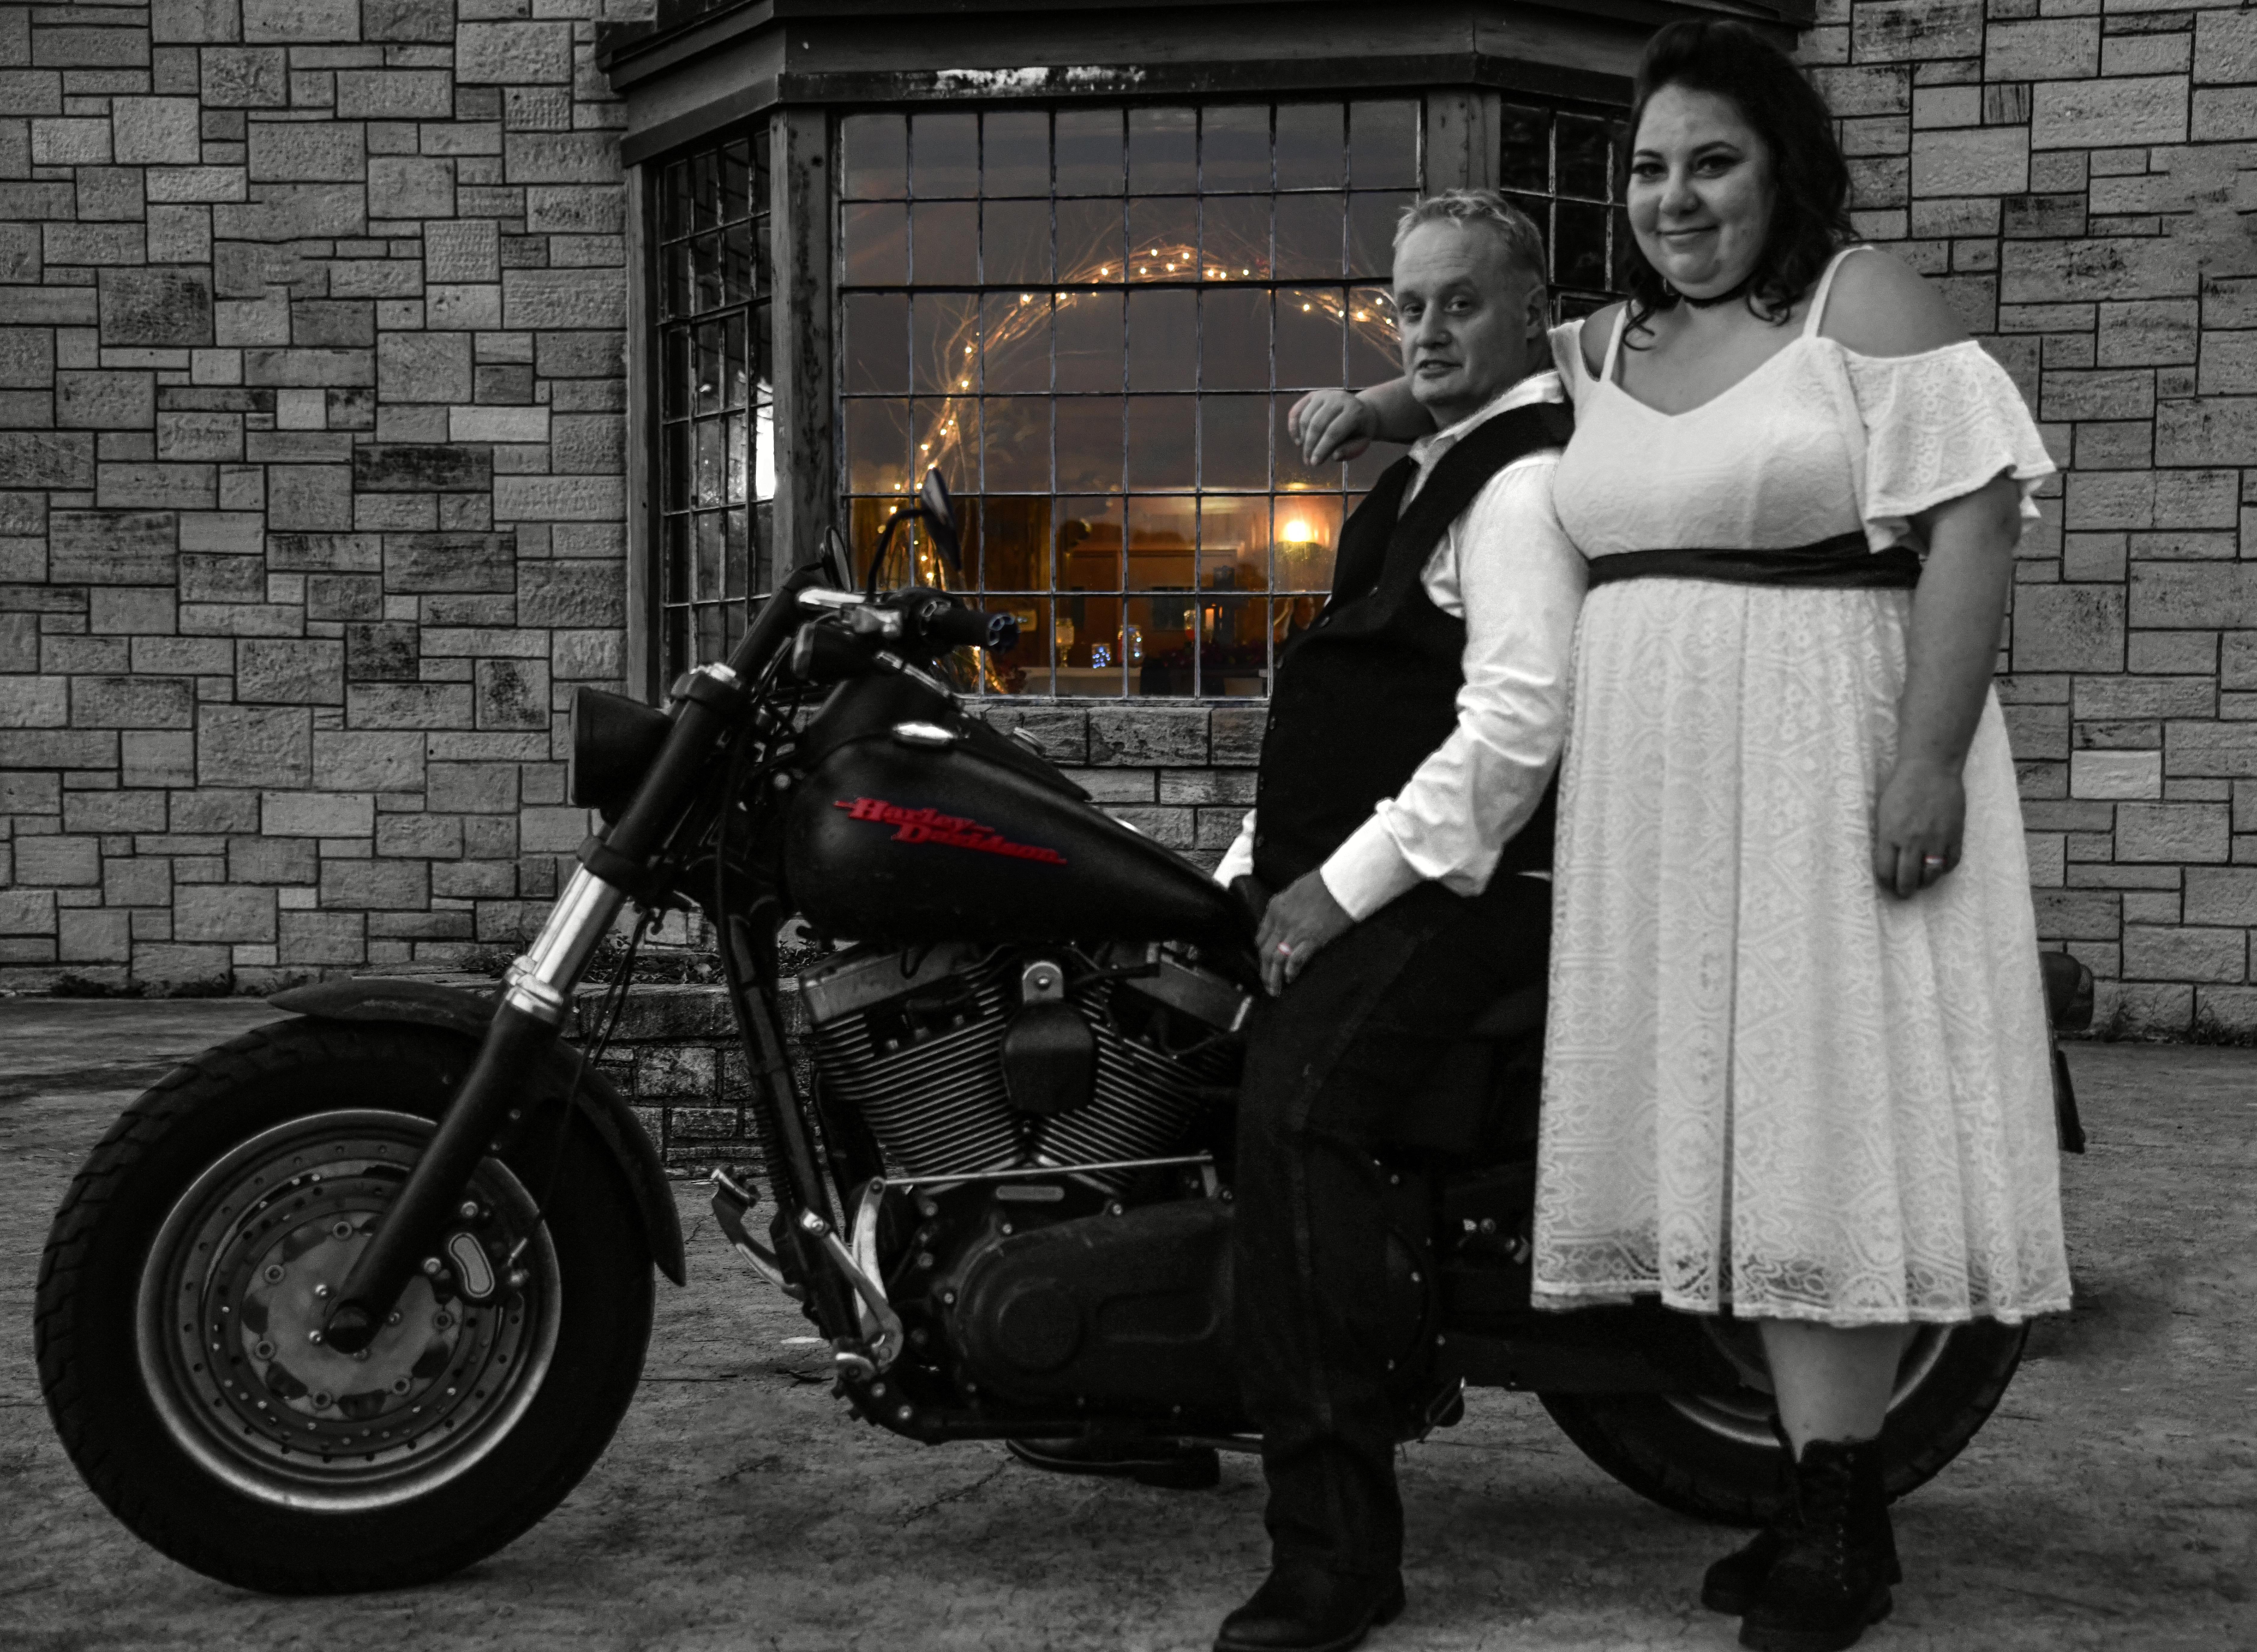 Bike & Bride